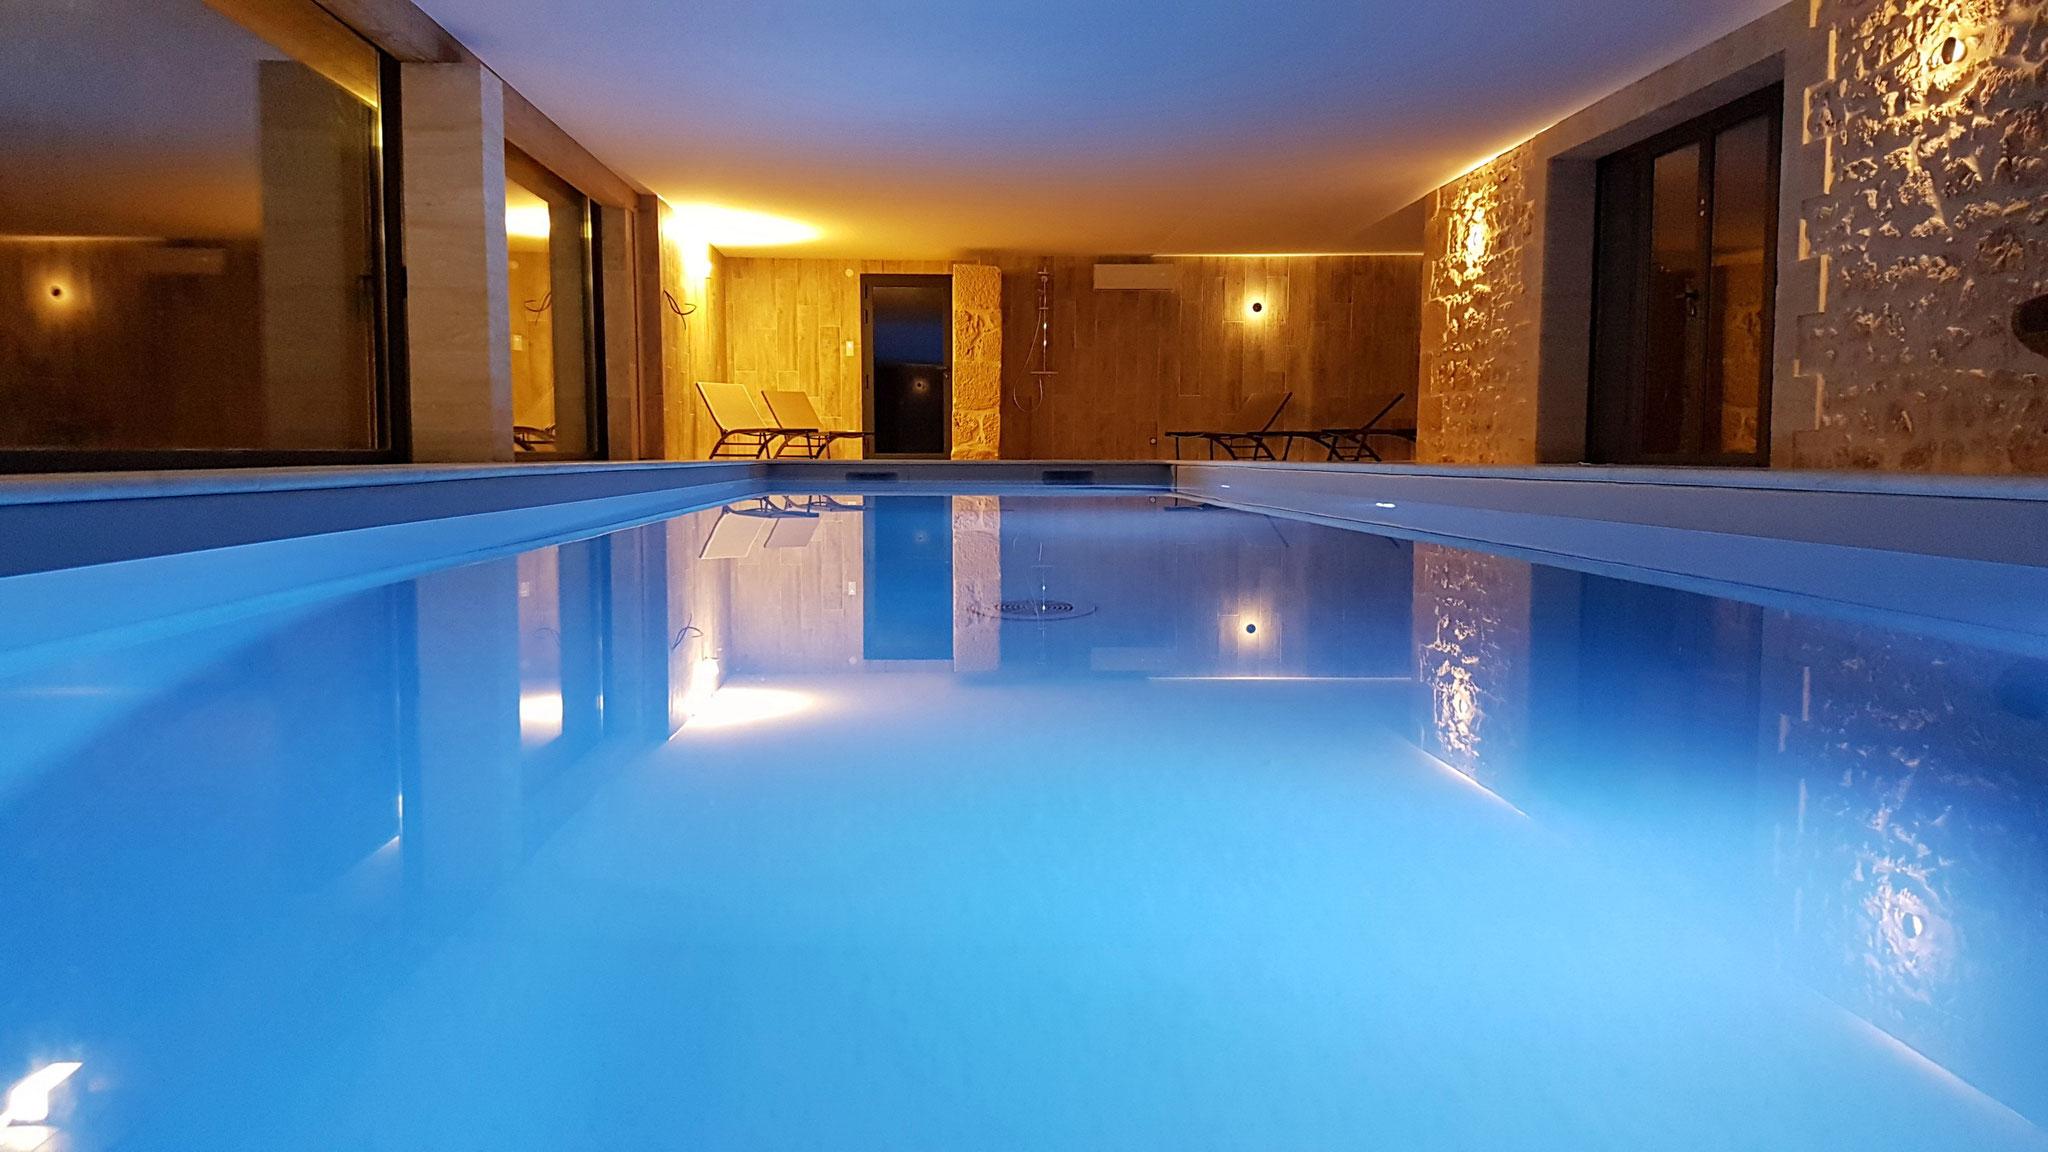 The Pool Le Petit Paradis 24 Dordogne Chambre d H´tes